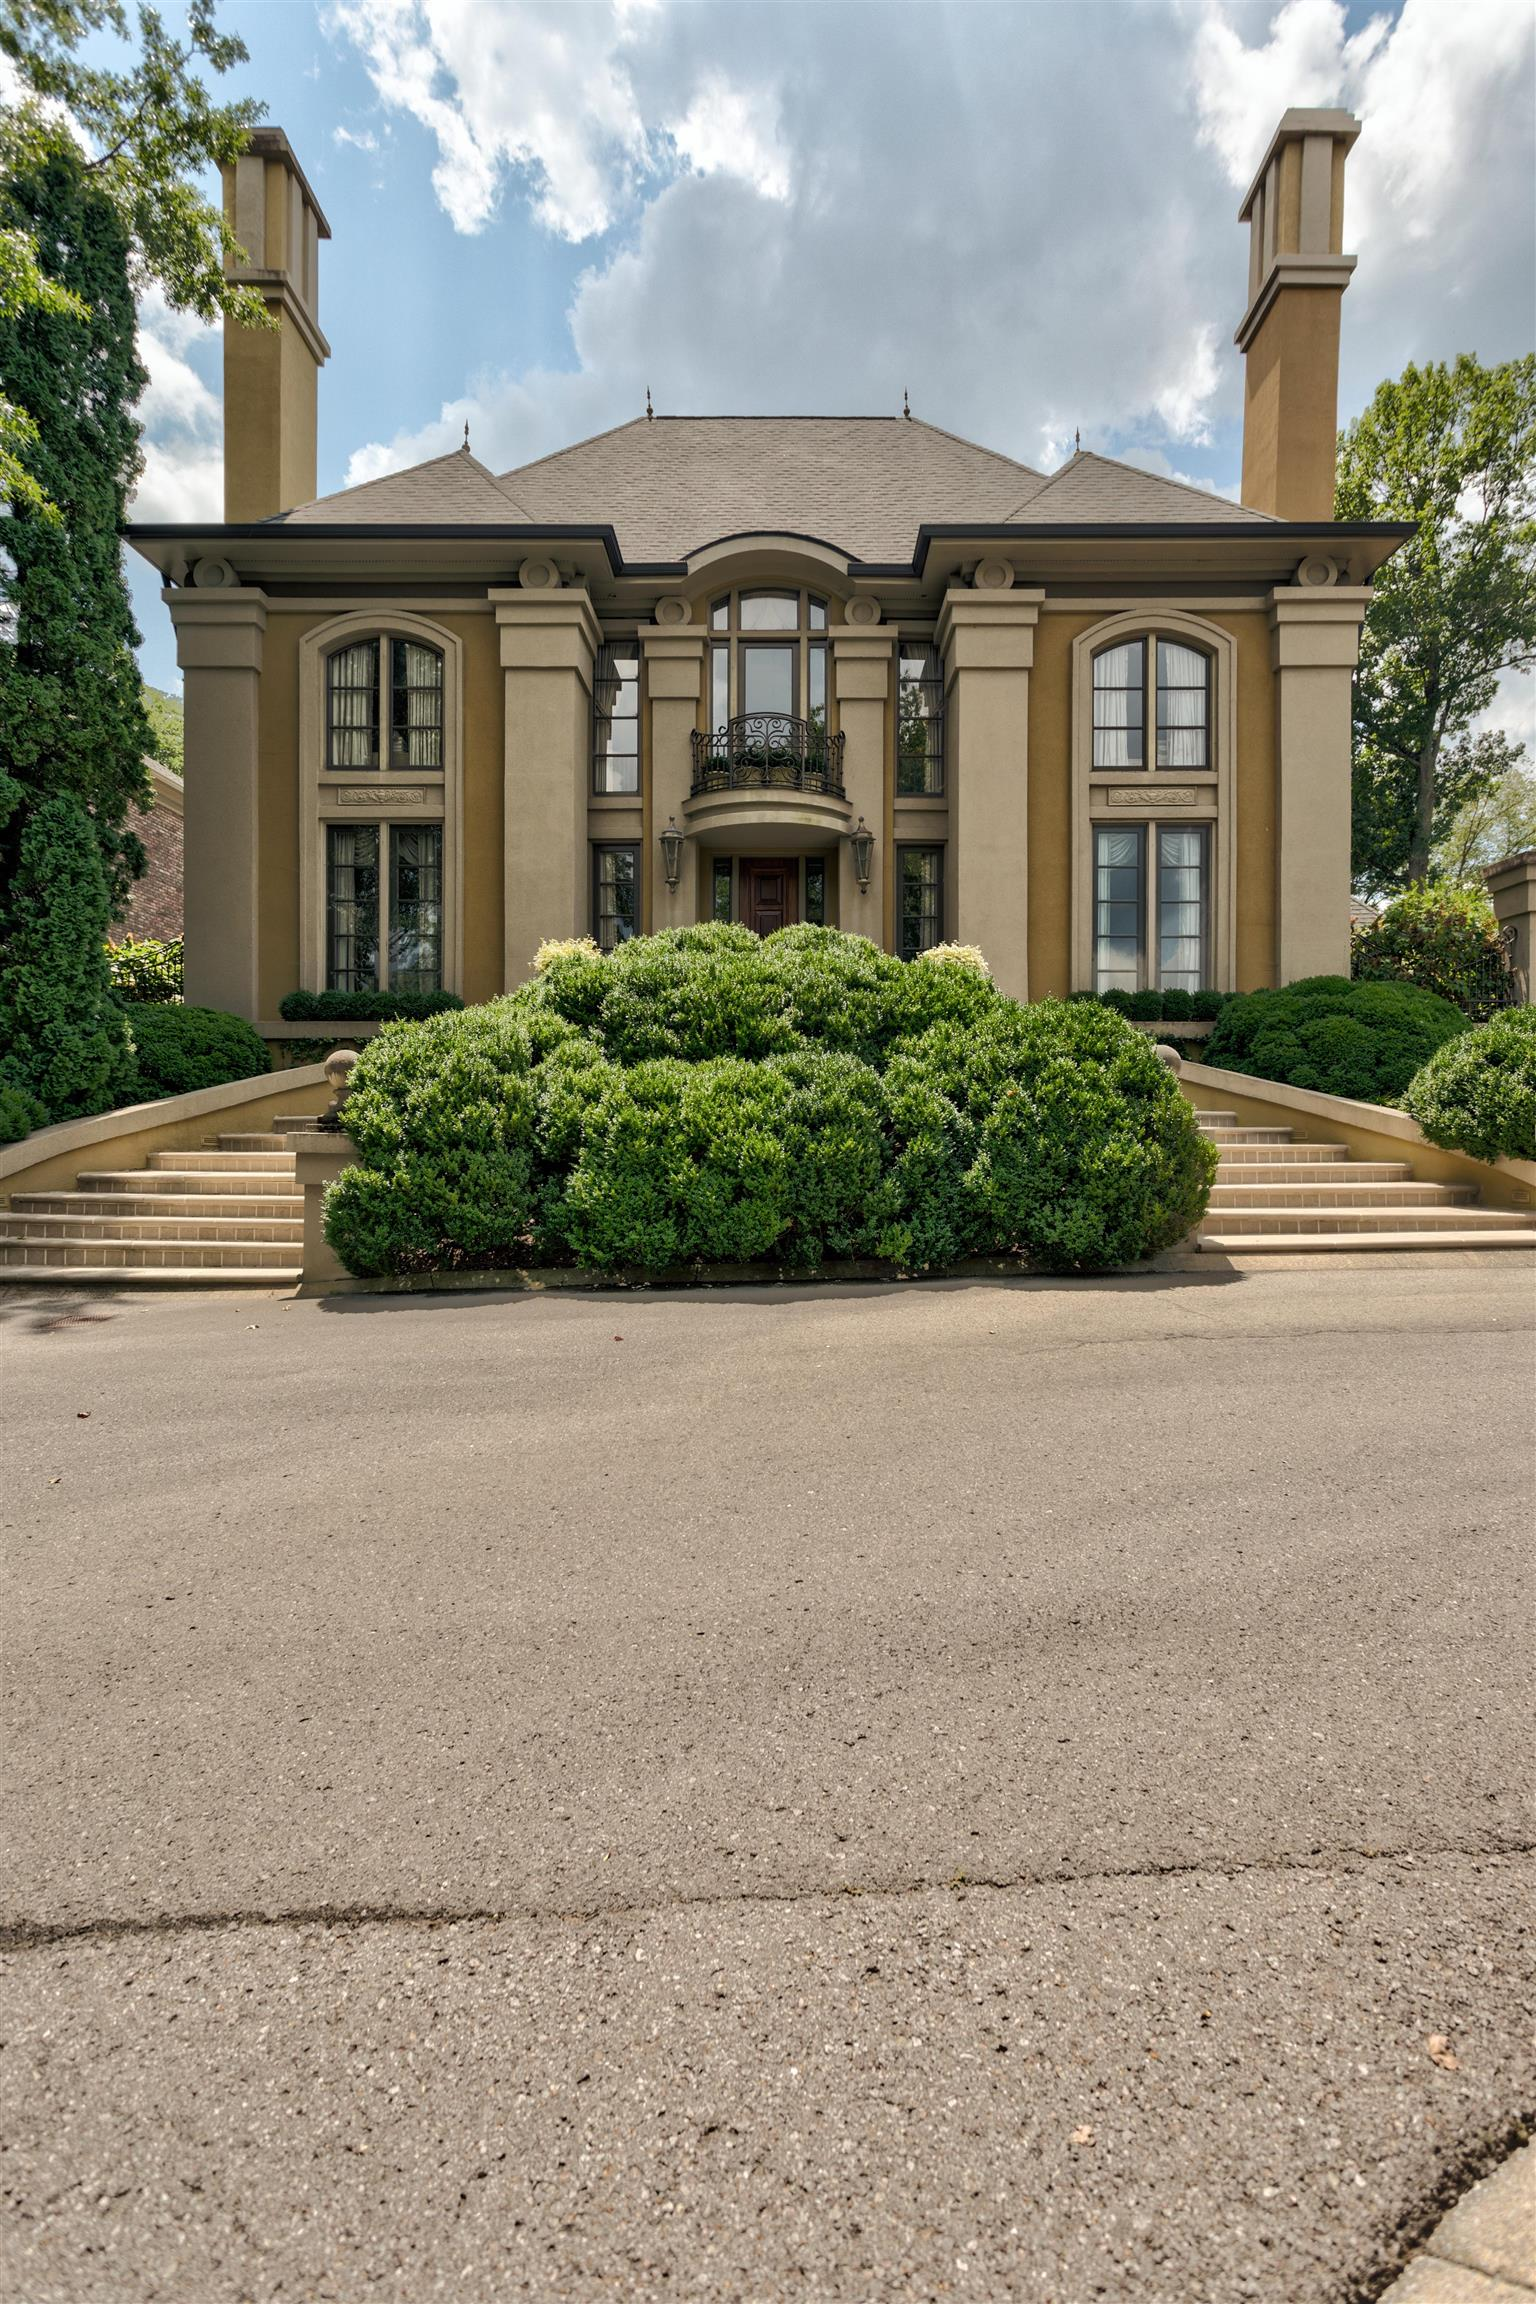 $2,265,500 - 3Br/4Ba -  for Sale in Abbottsford, Nashville